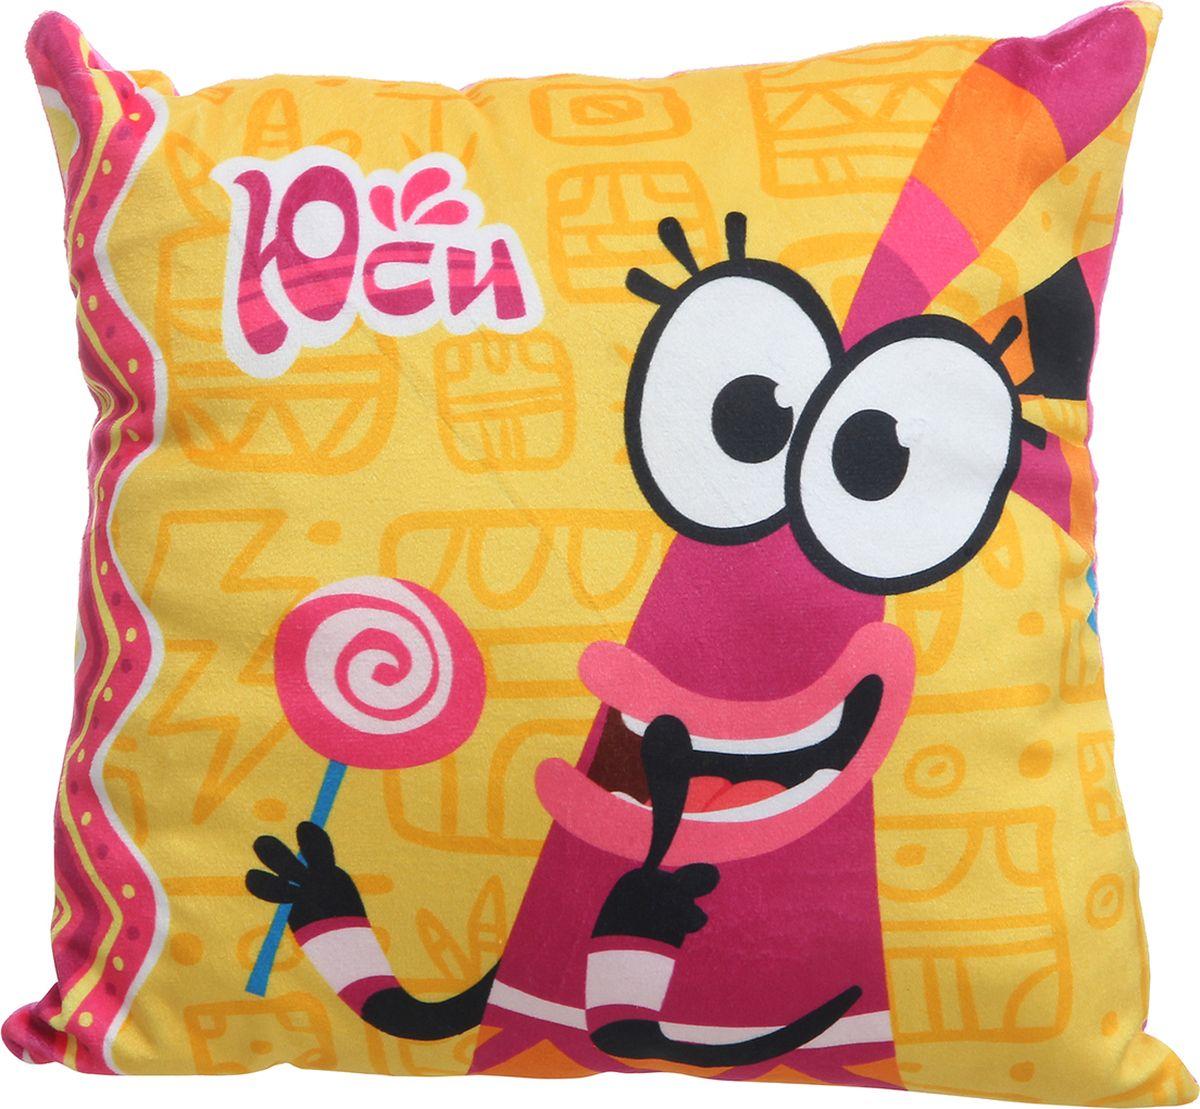 Куми-Куми Мягкая игрушка-подушка Юси